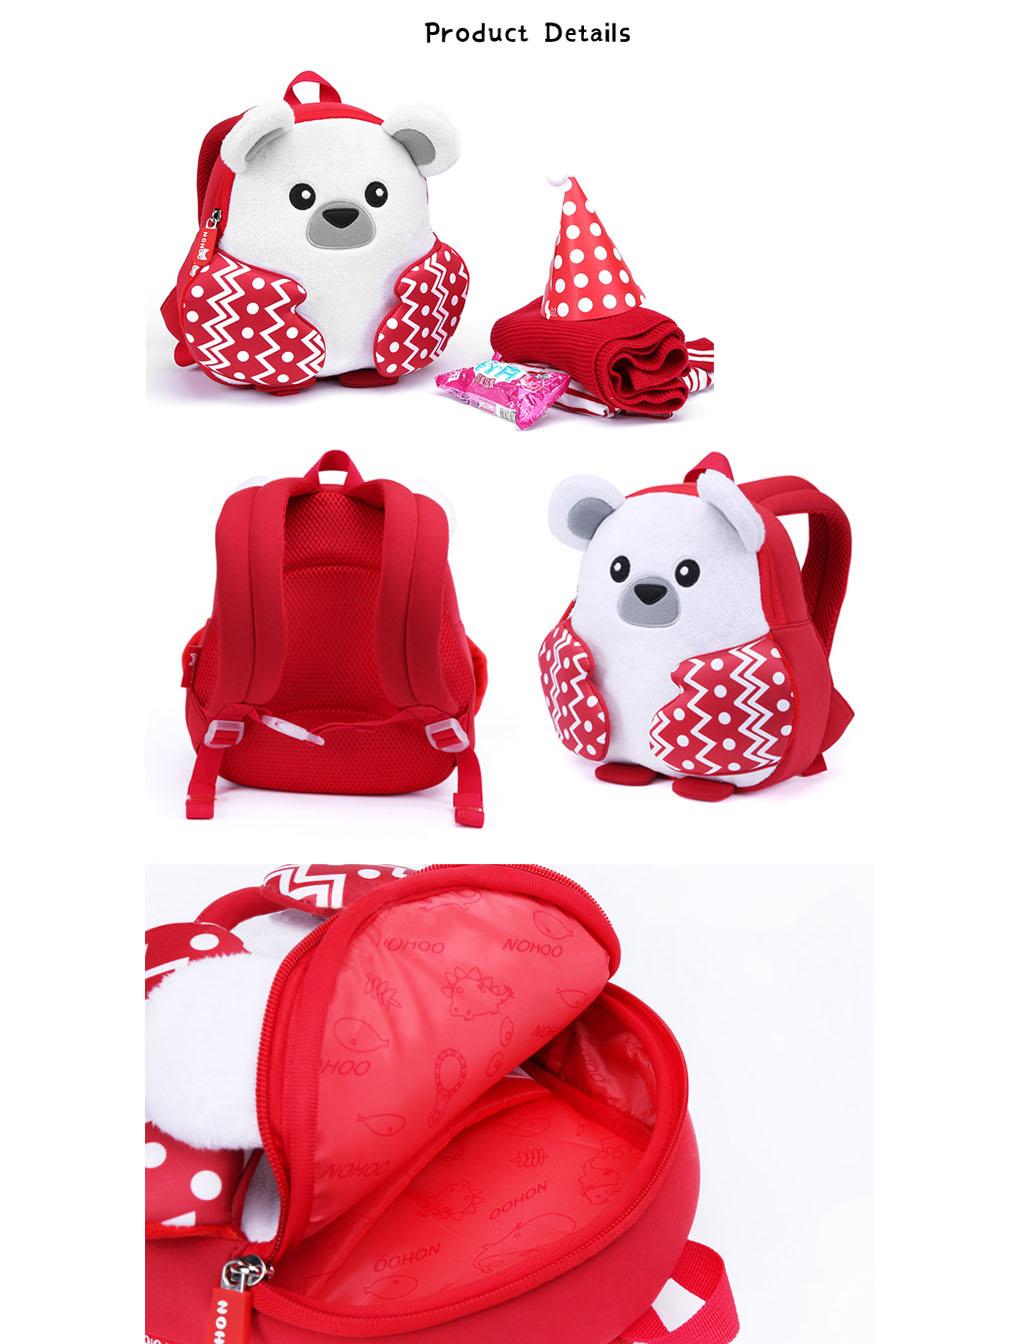 Nohoo Children Products-New Design Cartoon Neoprene Kids Lightweight Backpack With Plush